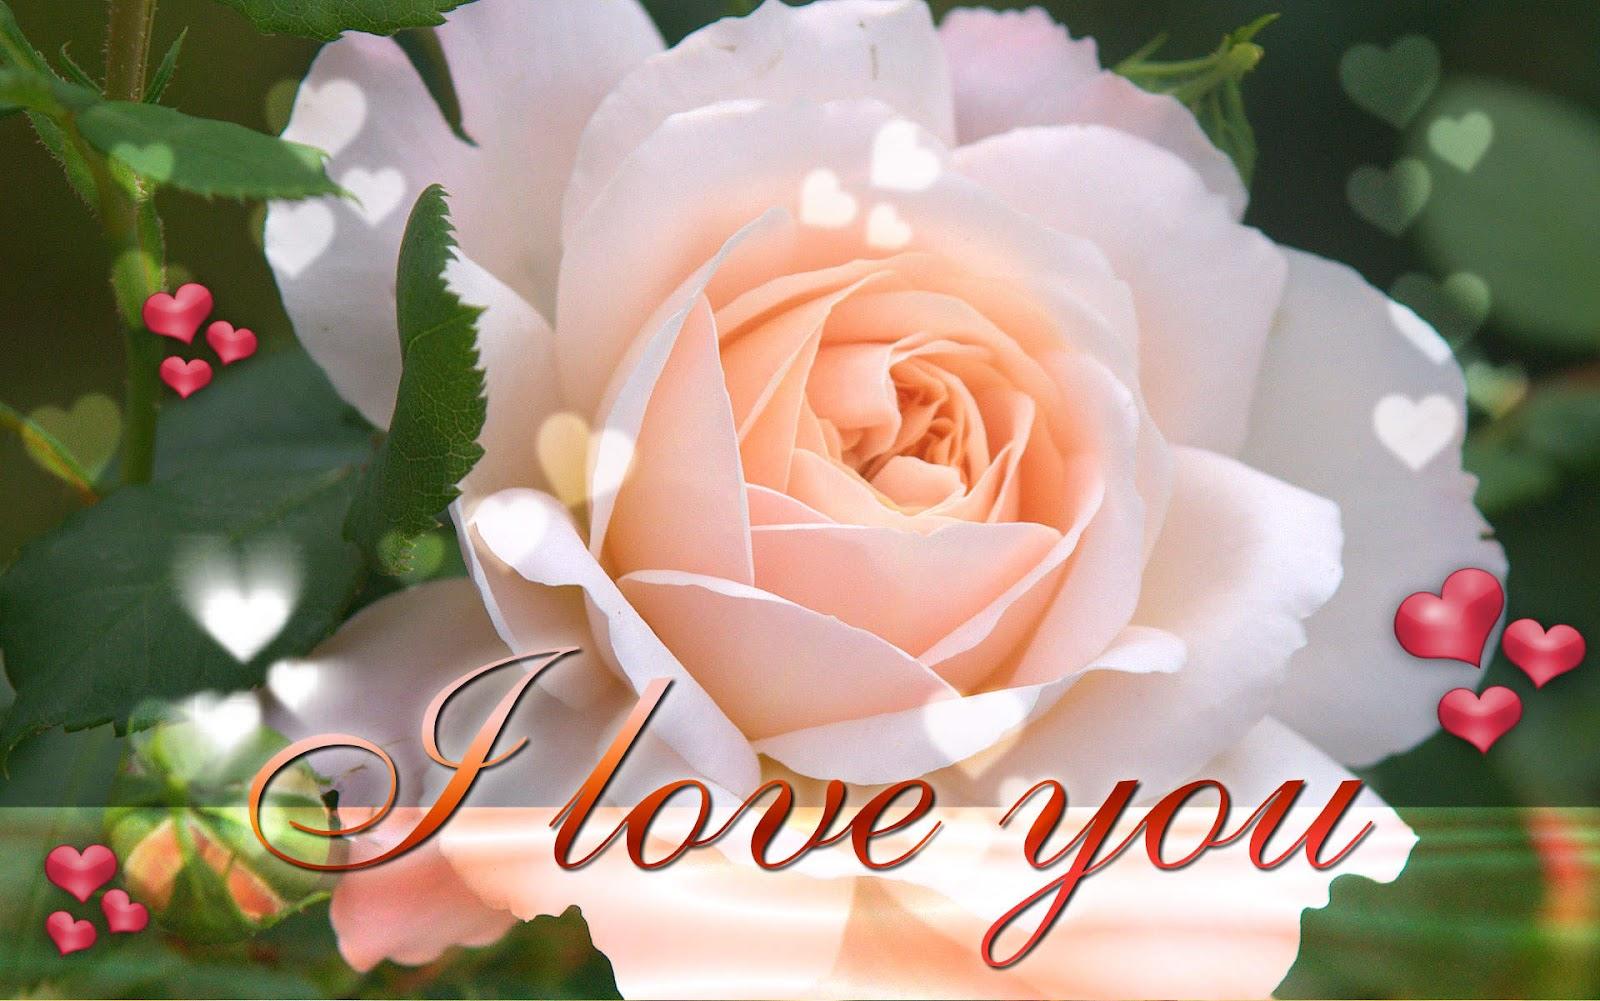 http://4.bp.blogspot.com/-3rCicfod5fo/T-6vas9jjLI/AAAAAAAAB5k/Sqs5RHnhjus/s1600/I-Love-You-Wallpaper-Desktop.jpg